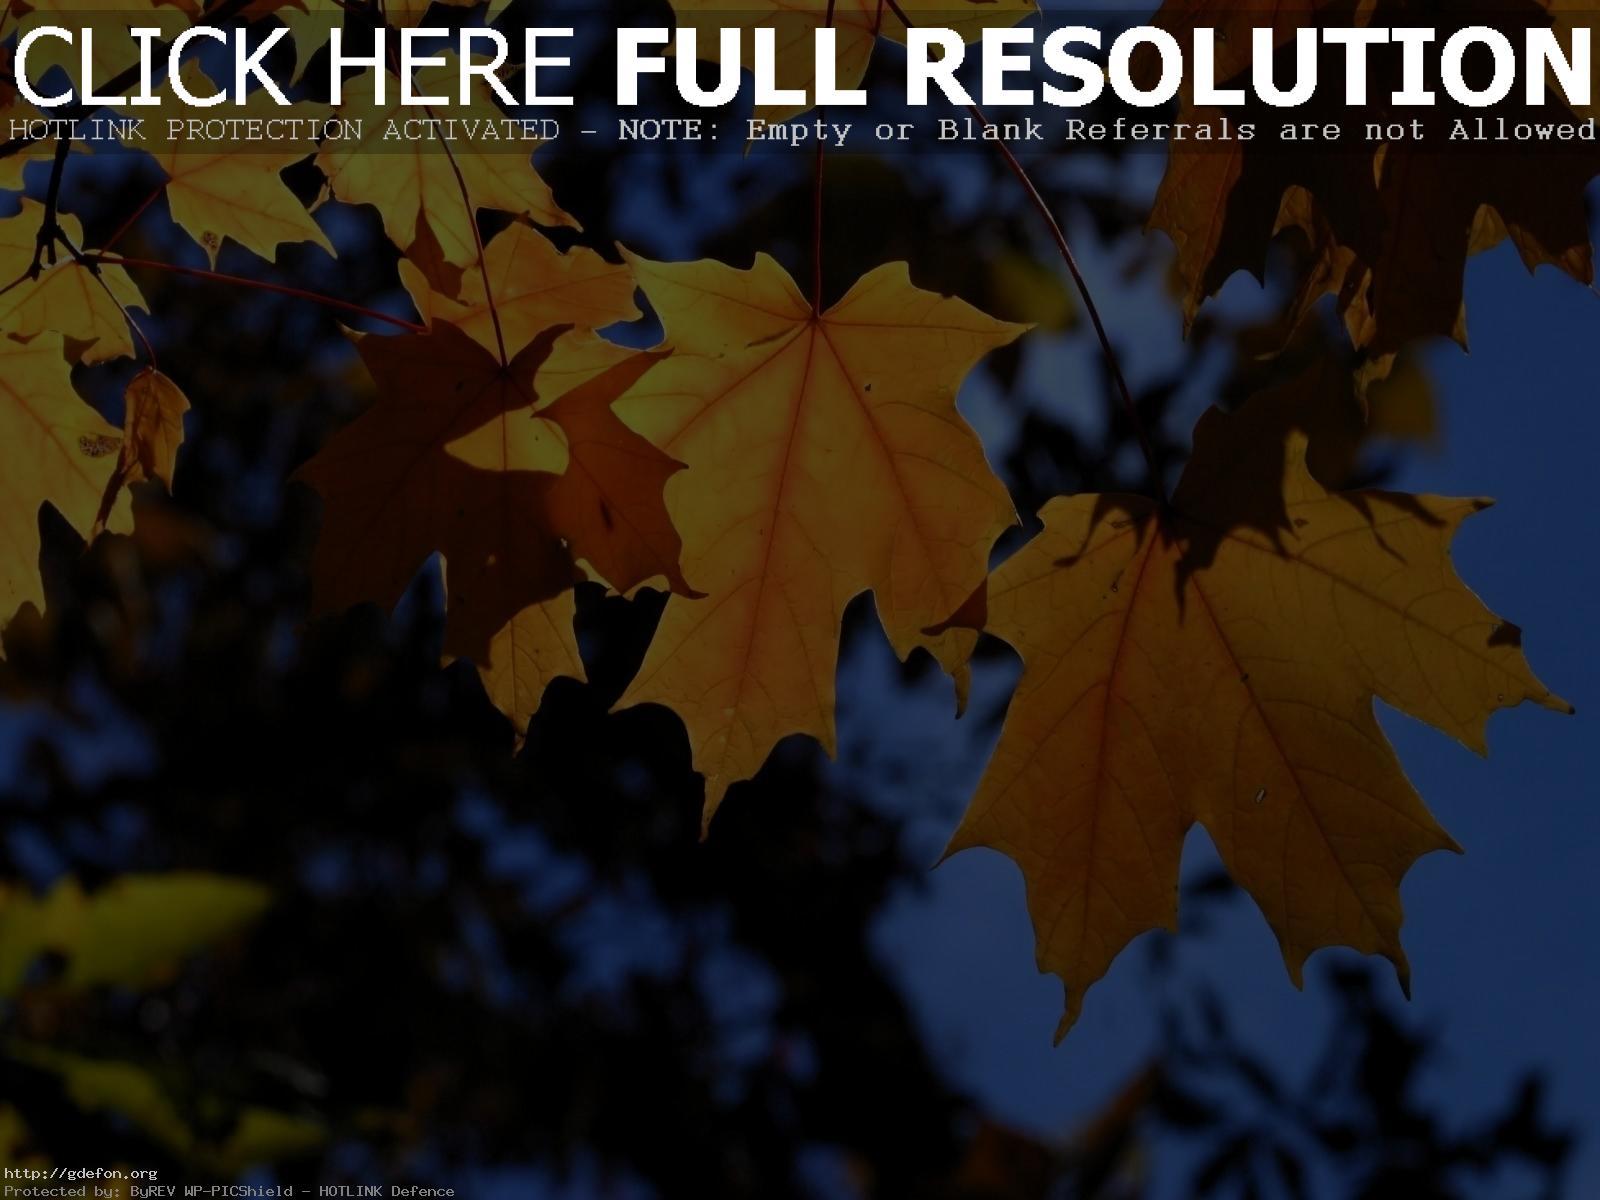 обои на рабочий стол осень листья 1920х1080 15095